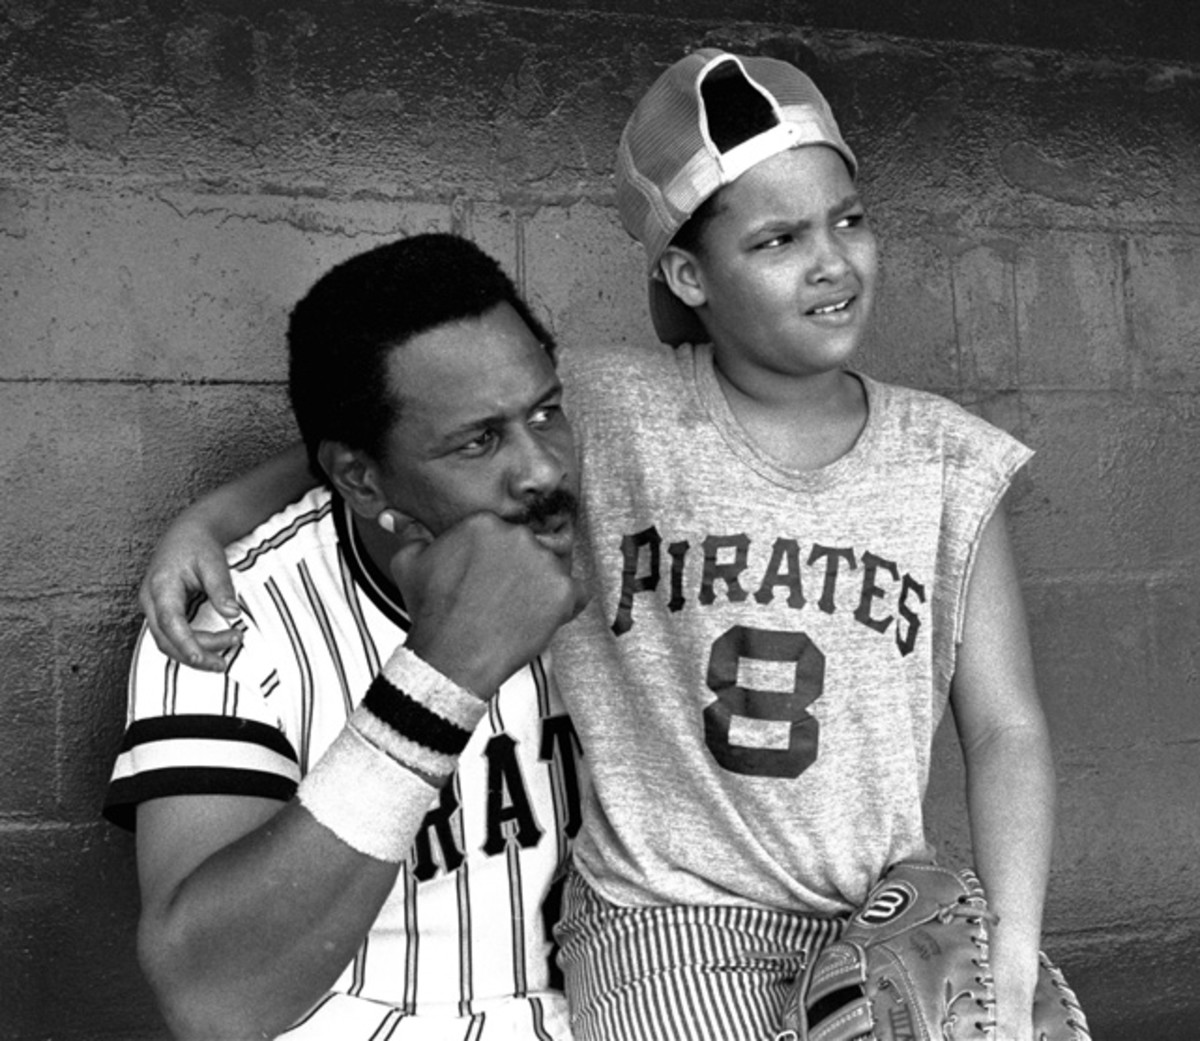 Willie Stargell and Willie Stargell Jr.